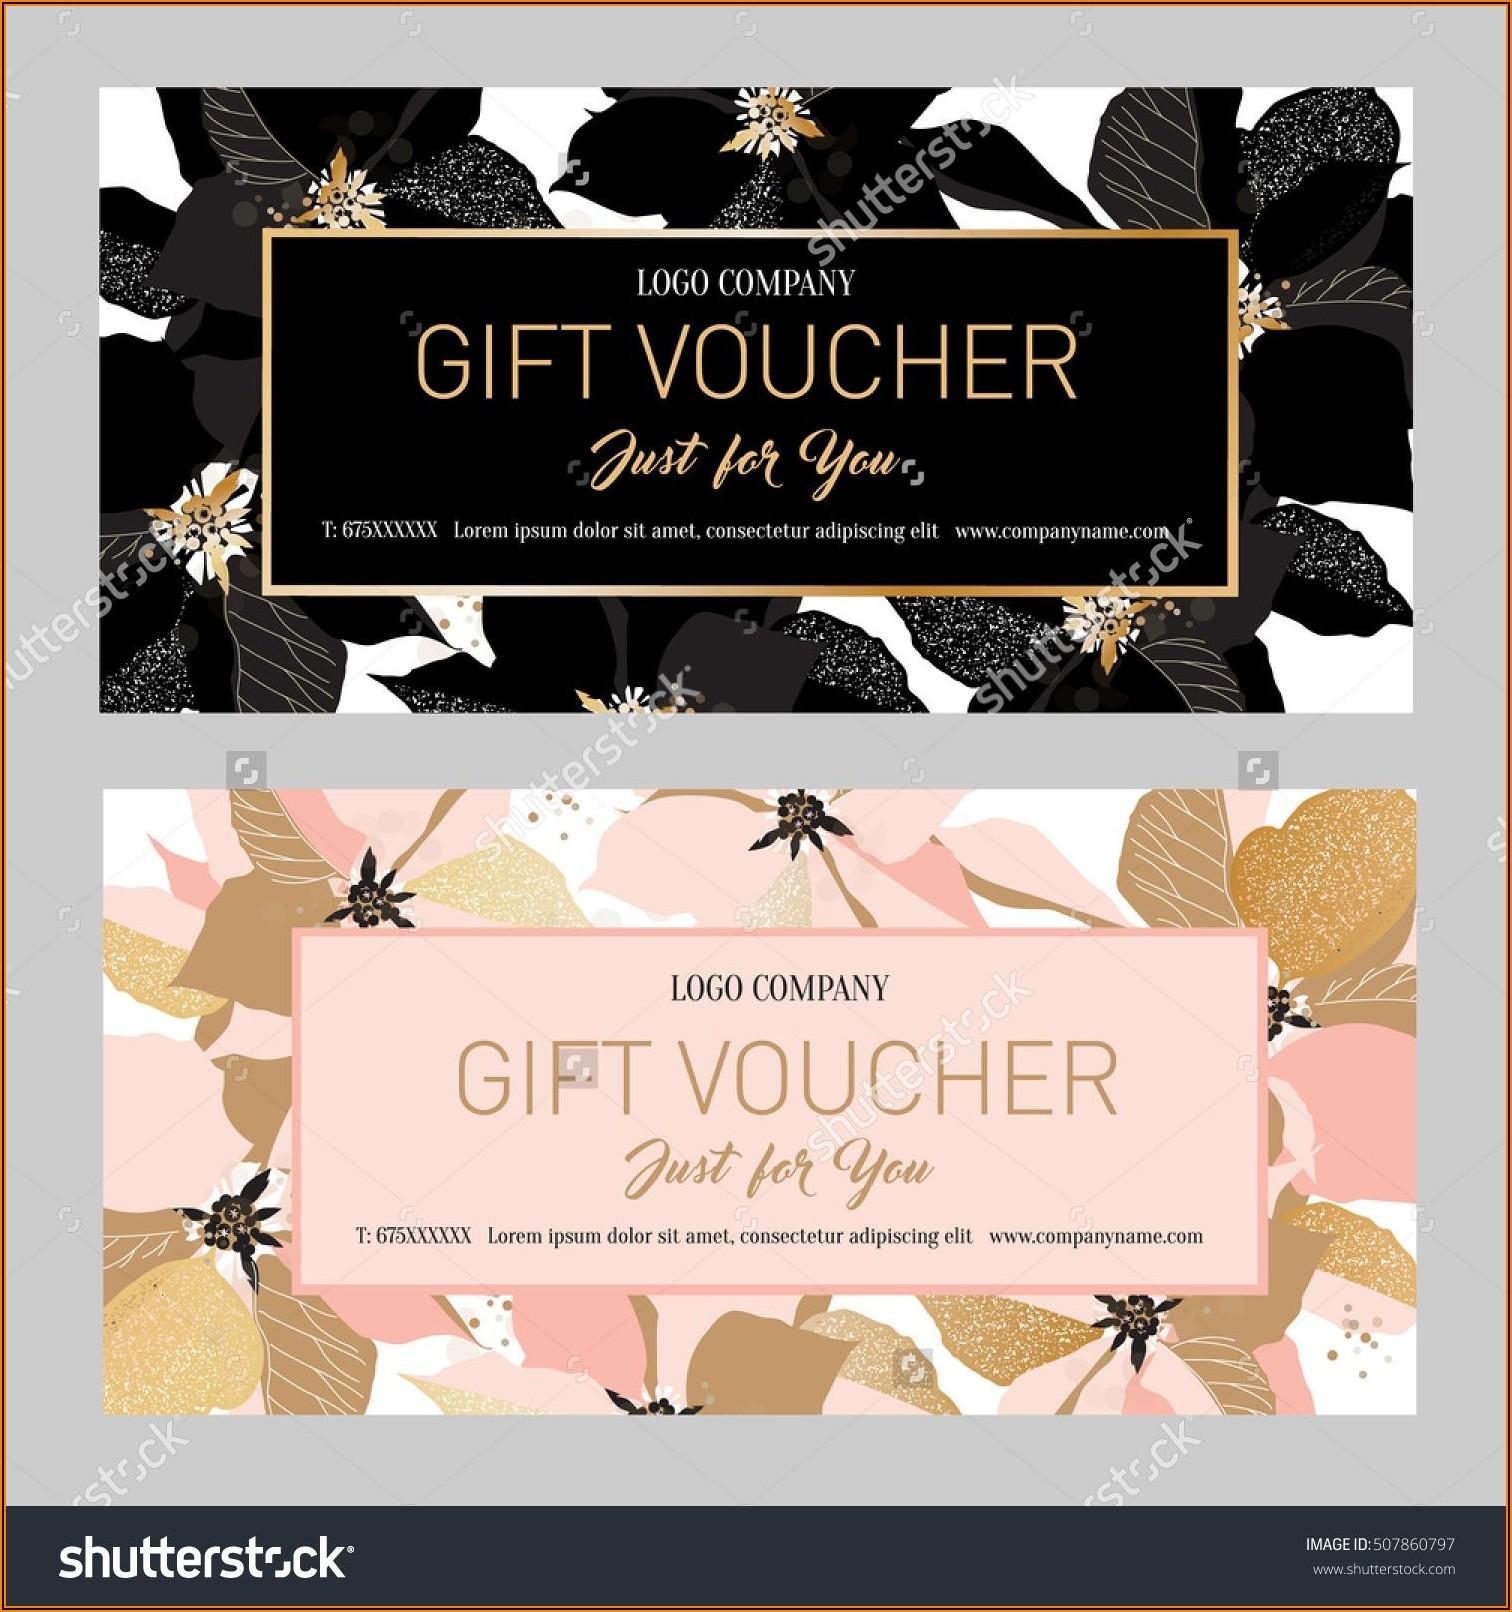 Beauty Salon Gift Vouchers Templates